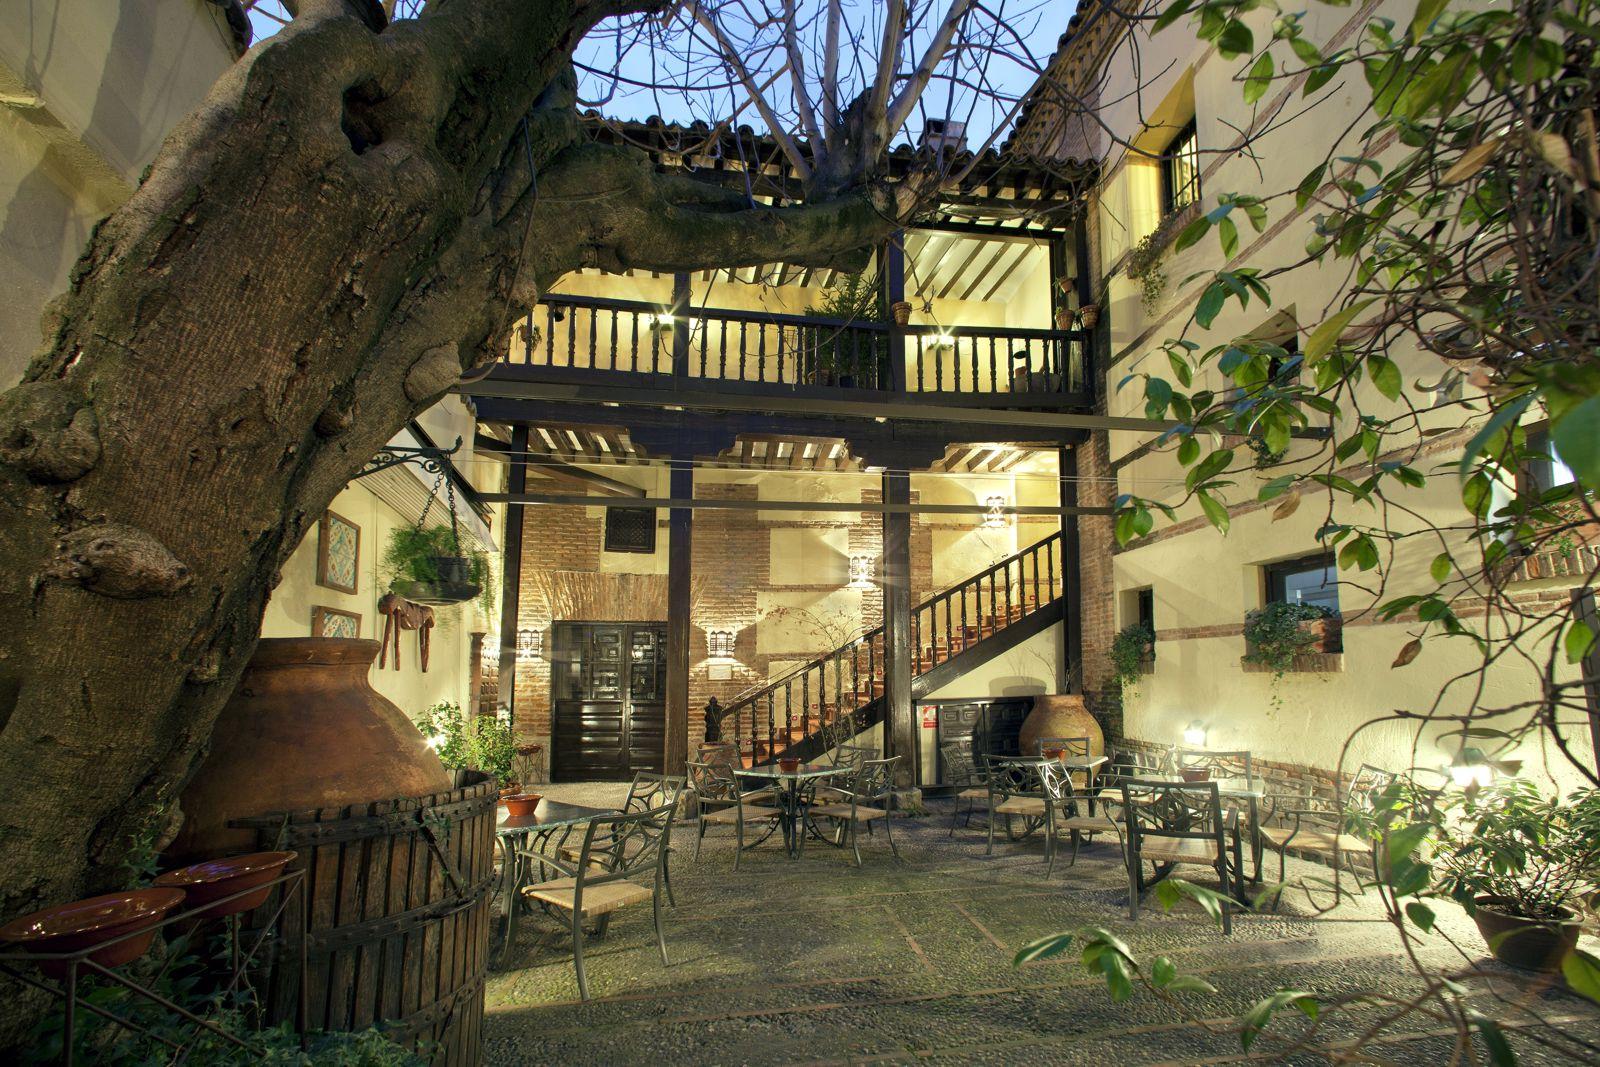 Paradores spanien hotel parador de alcala de henares for Toldos alcala de henares